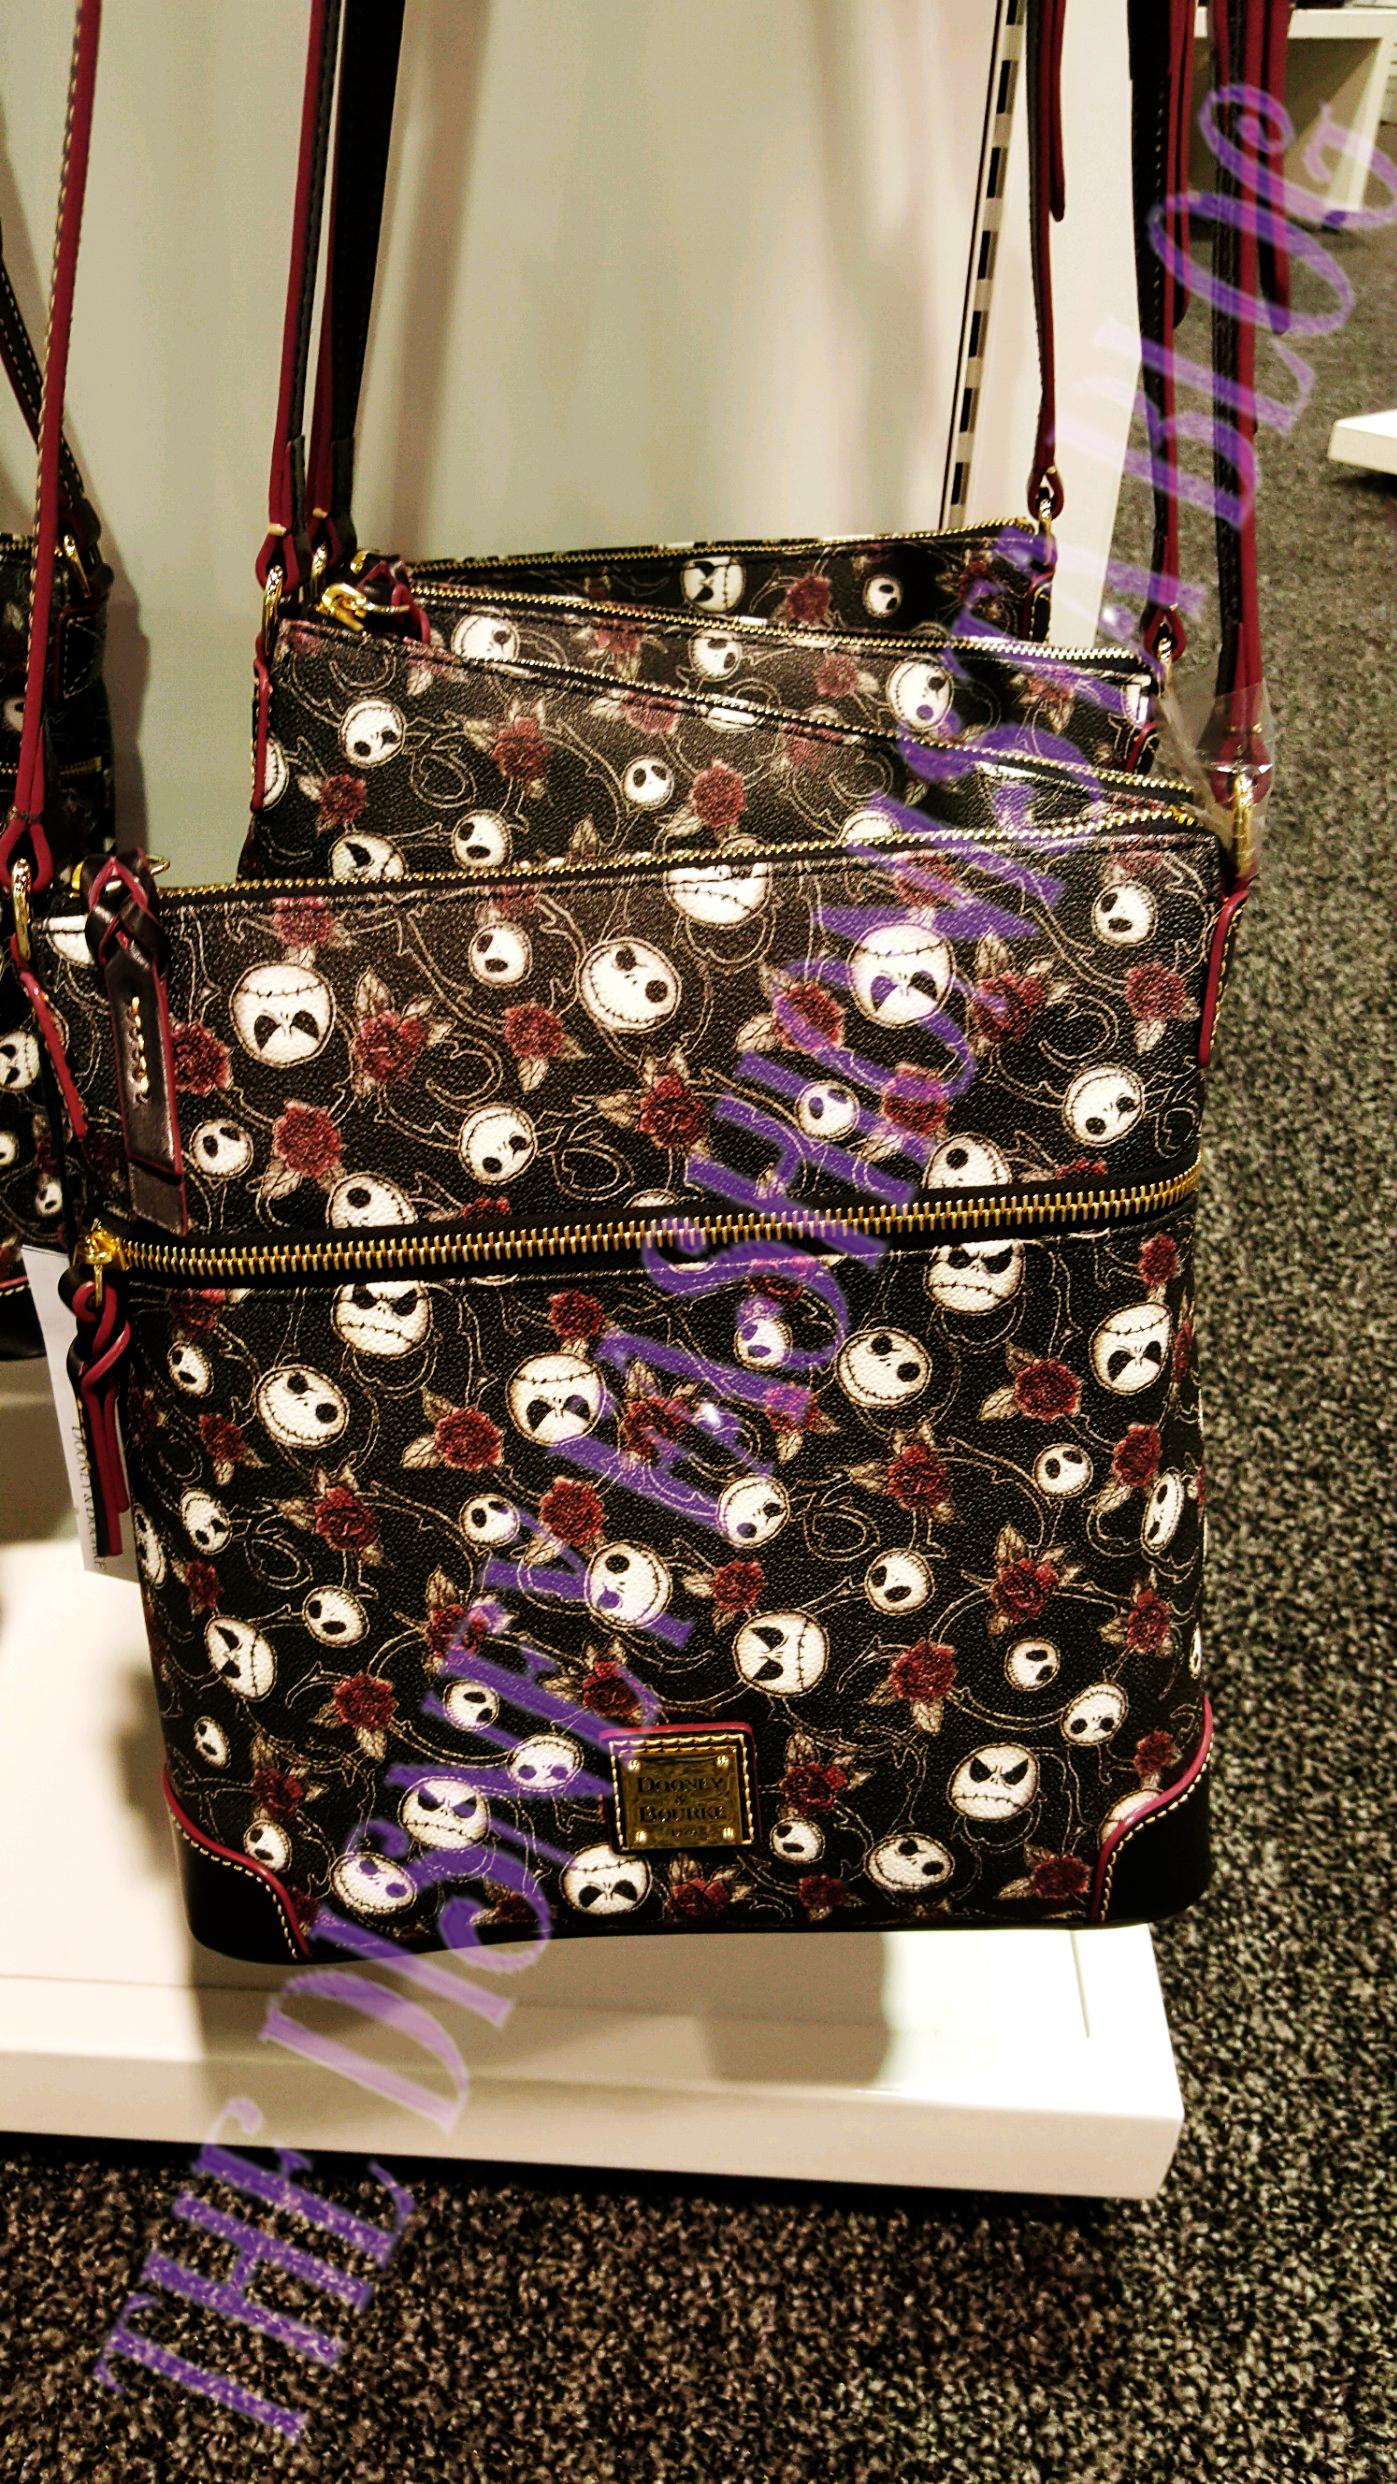 Nightmare Before Christmas Dooney Amp Bourke Bags At D23